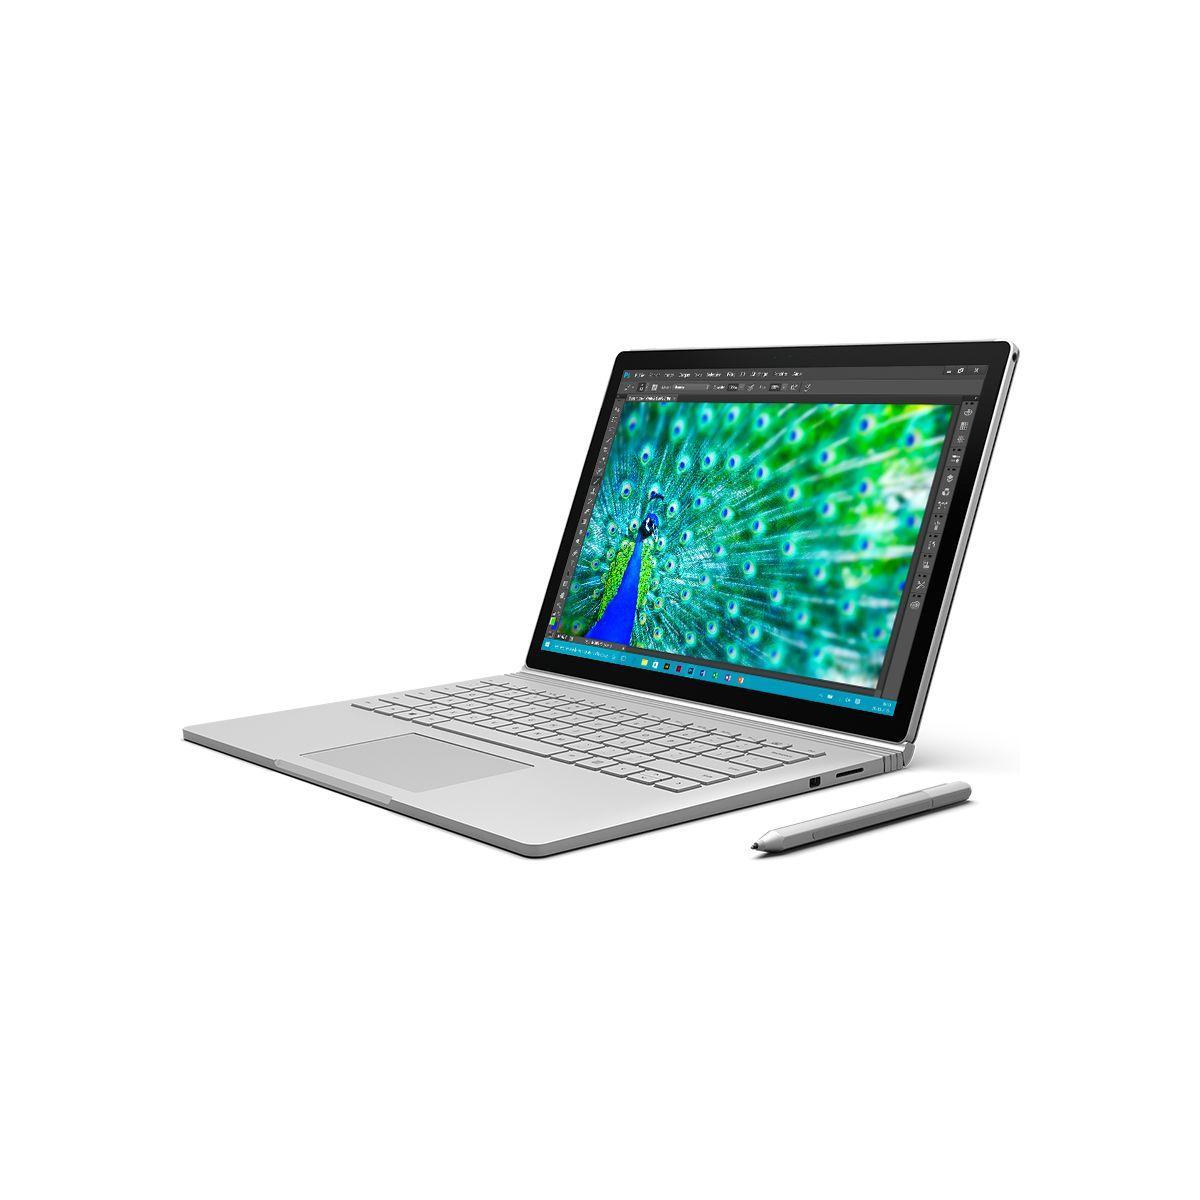 Microsoft surface book 256go intel i7 8go (photo)